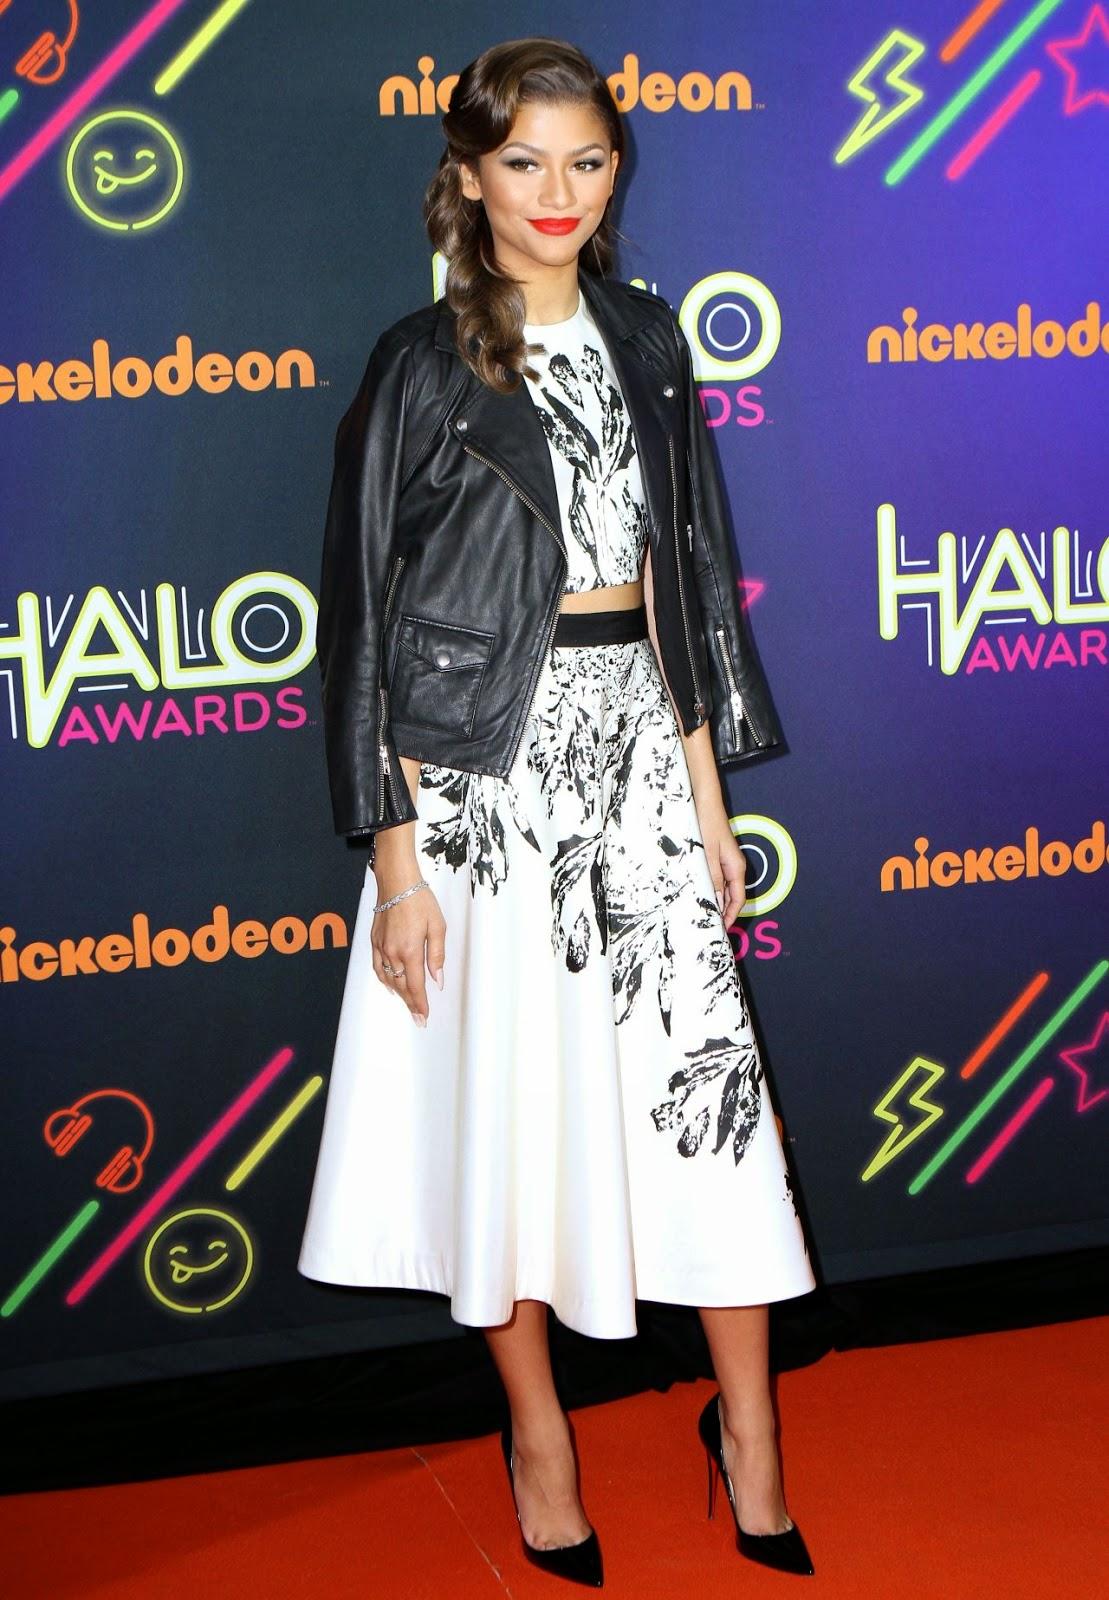 zendaya-coleman-2014-nickelodeon-halo-awards